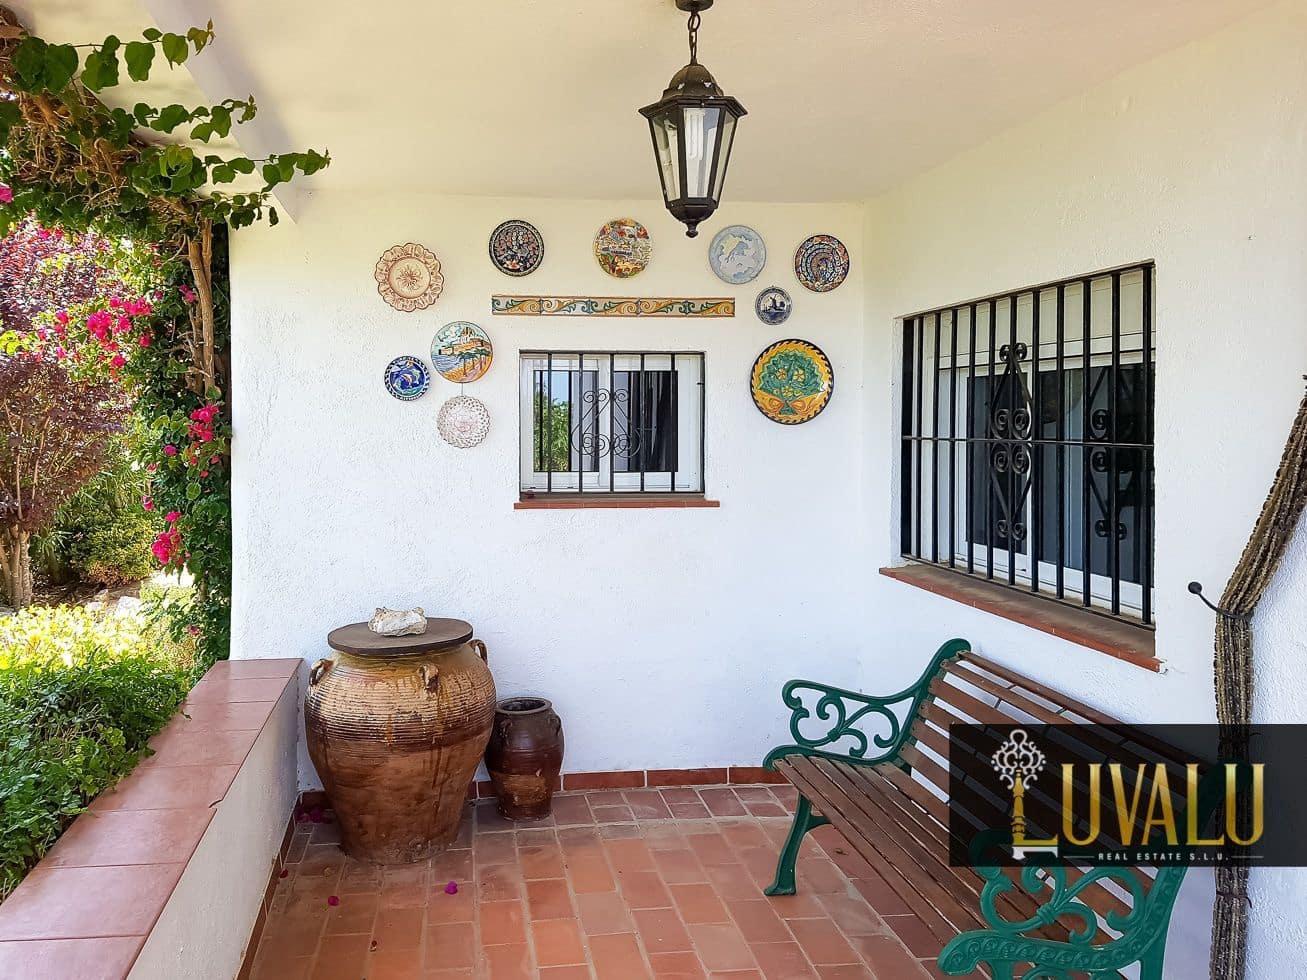 4 chambre Villa/Maison à vendre à Benicarlo avec piscine garage - 230 000 € (Ref: 4701328)